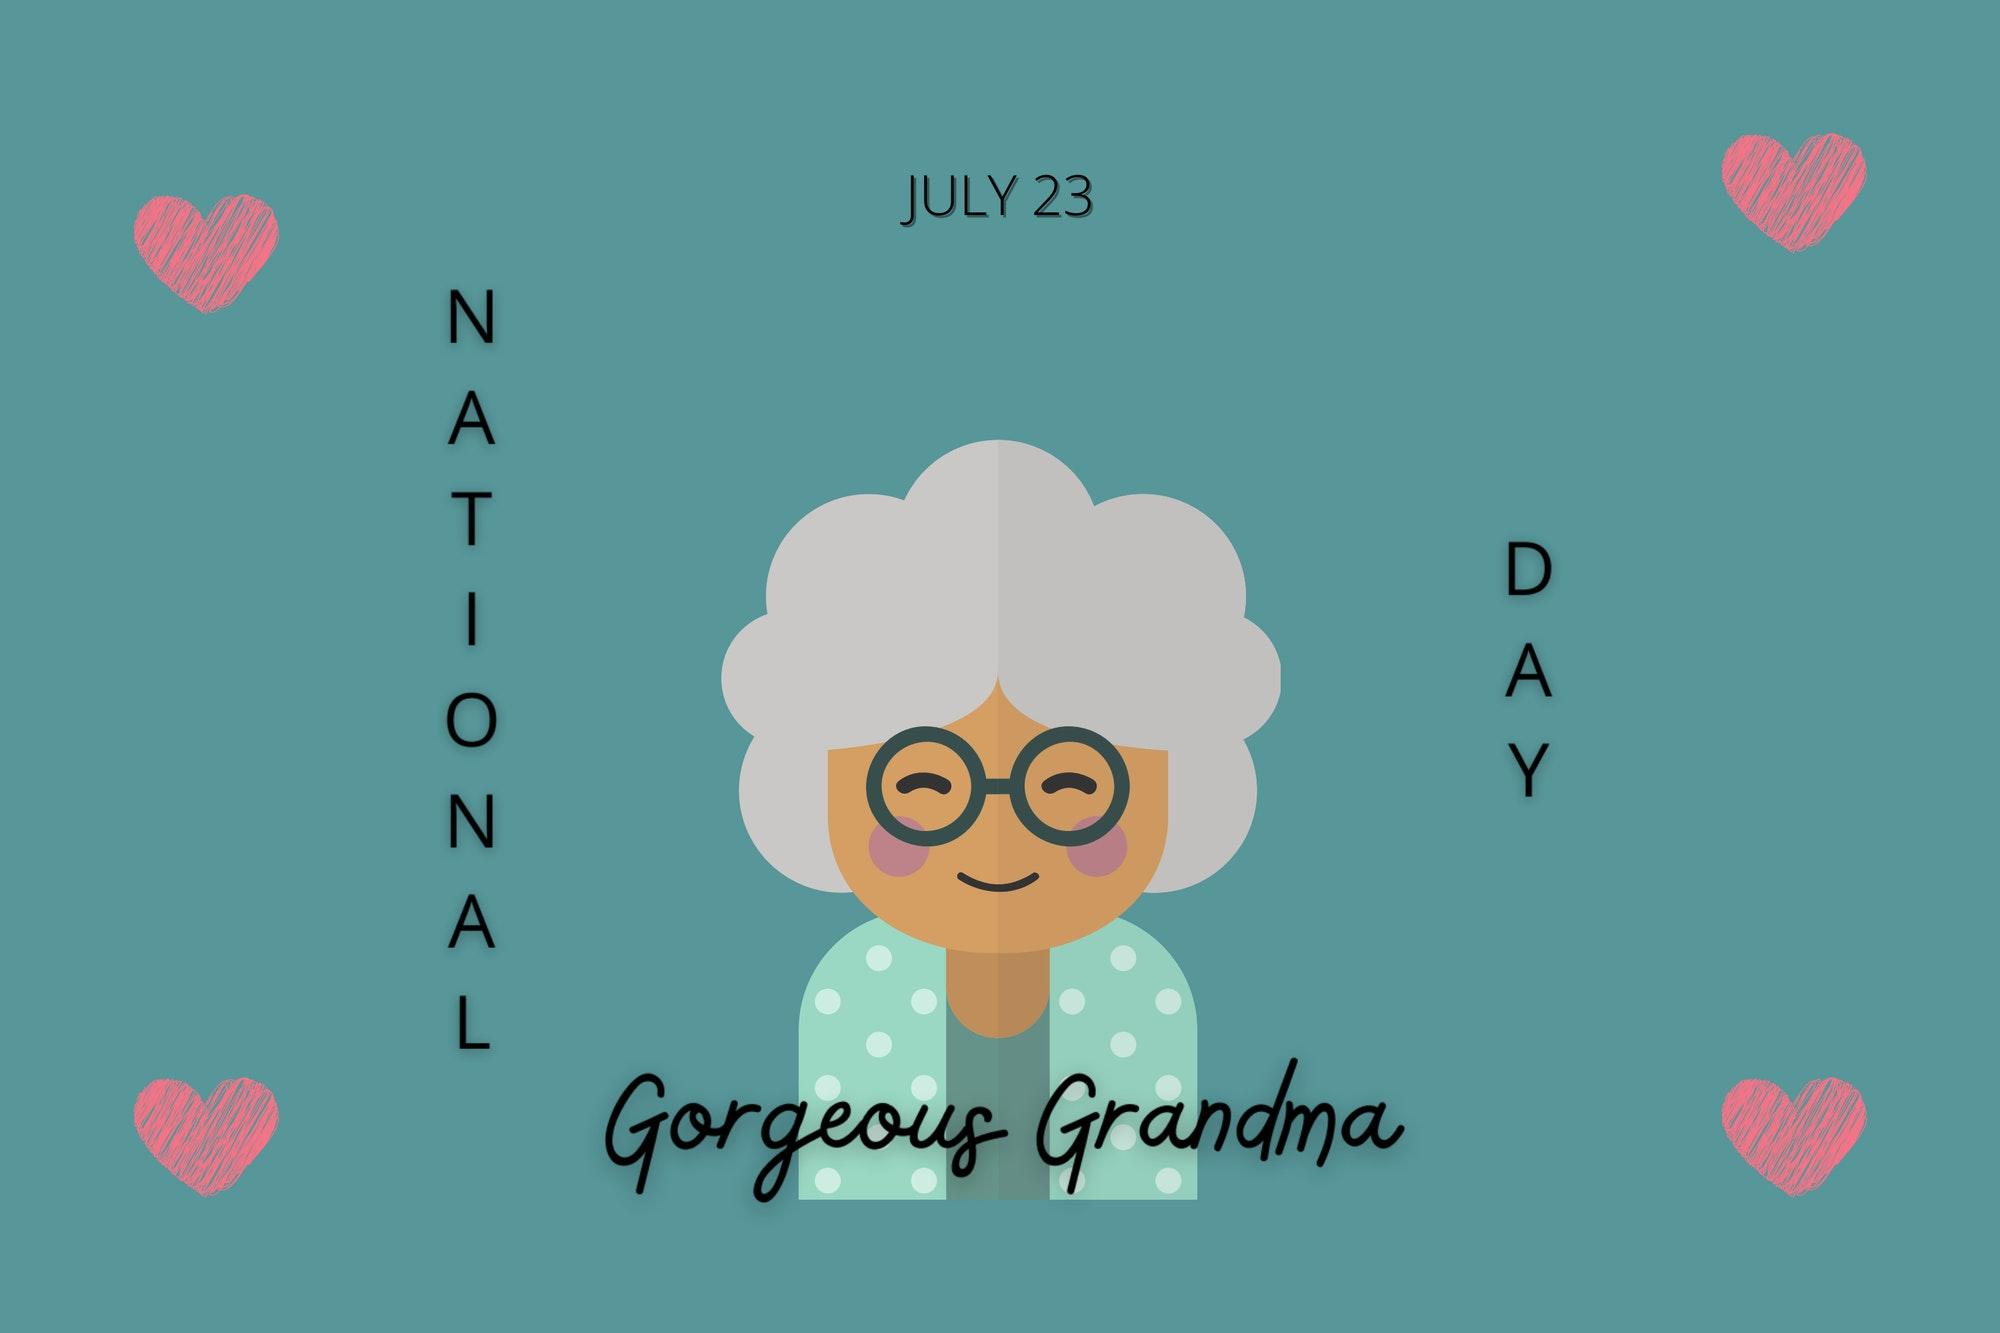 National Gorgeous Grandma Day